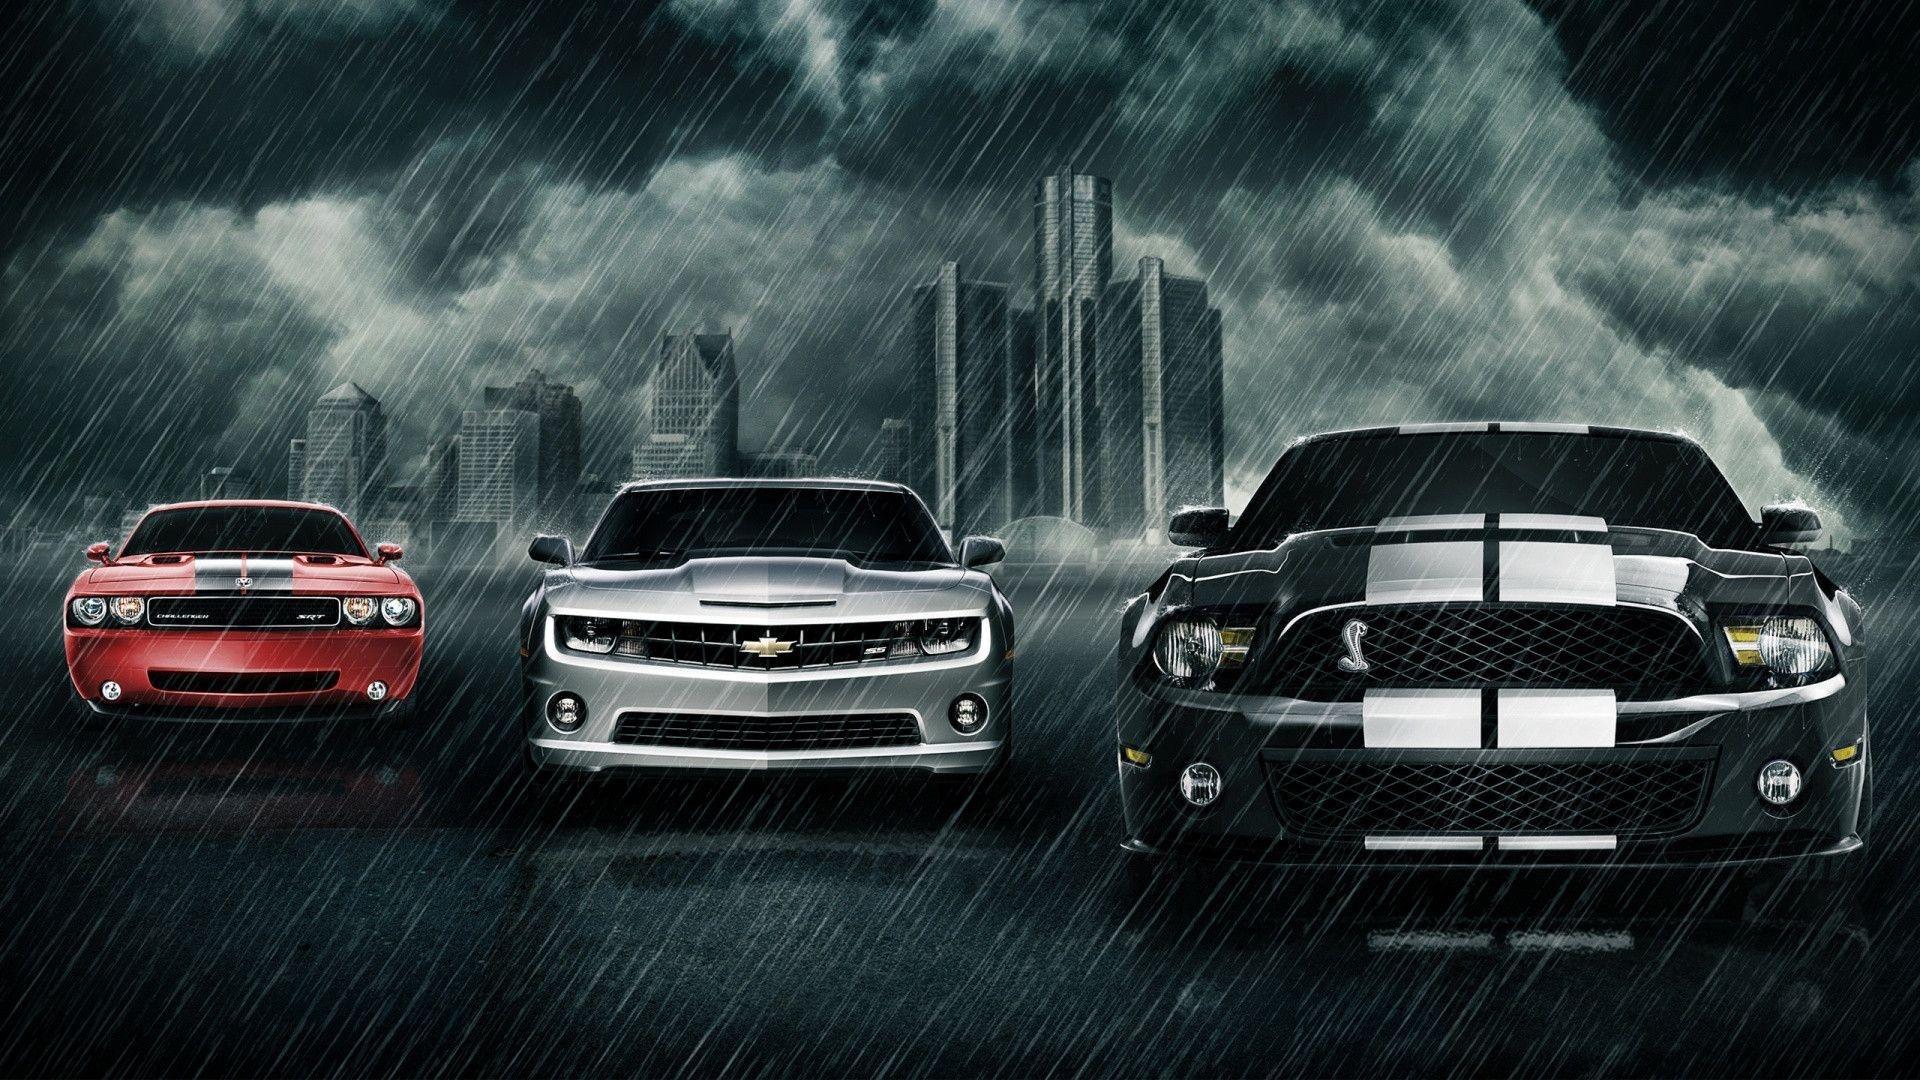 1080p sport car background | ololoshenka | Pinterest | Car backgrounds